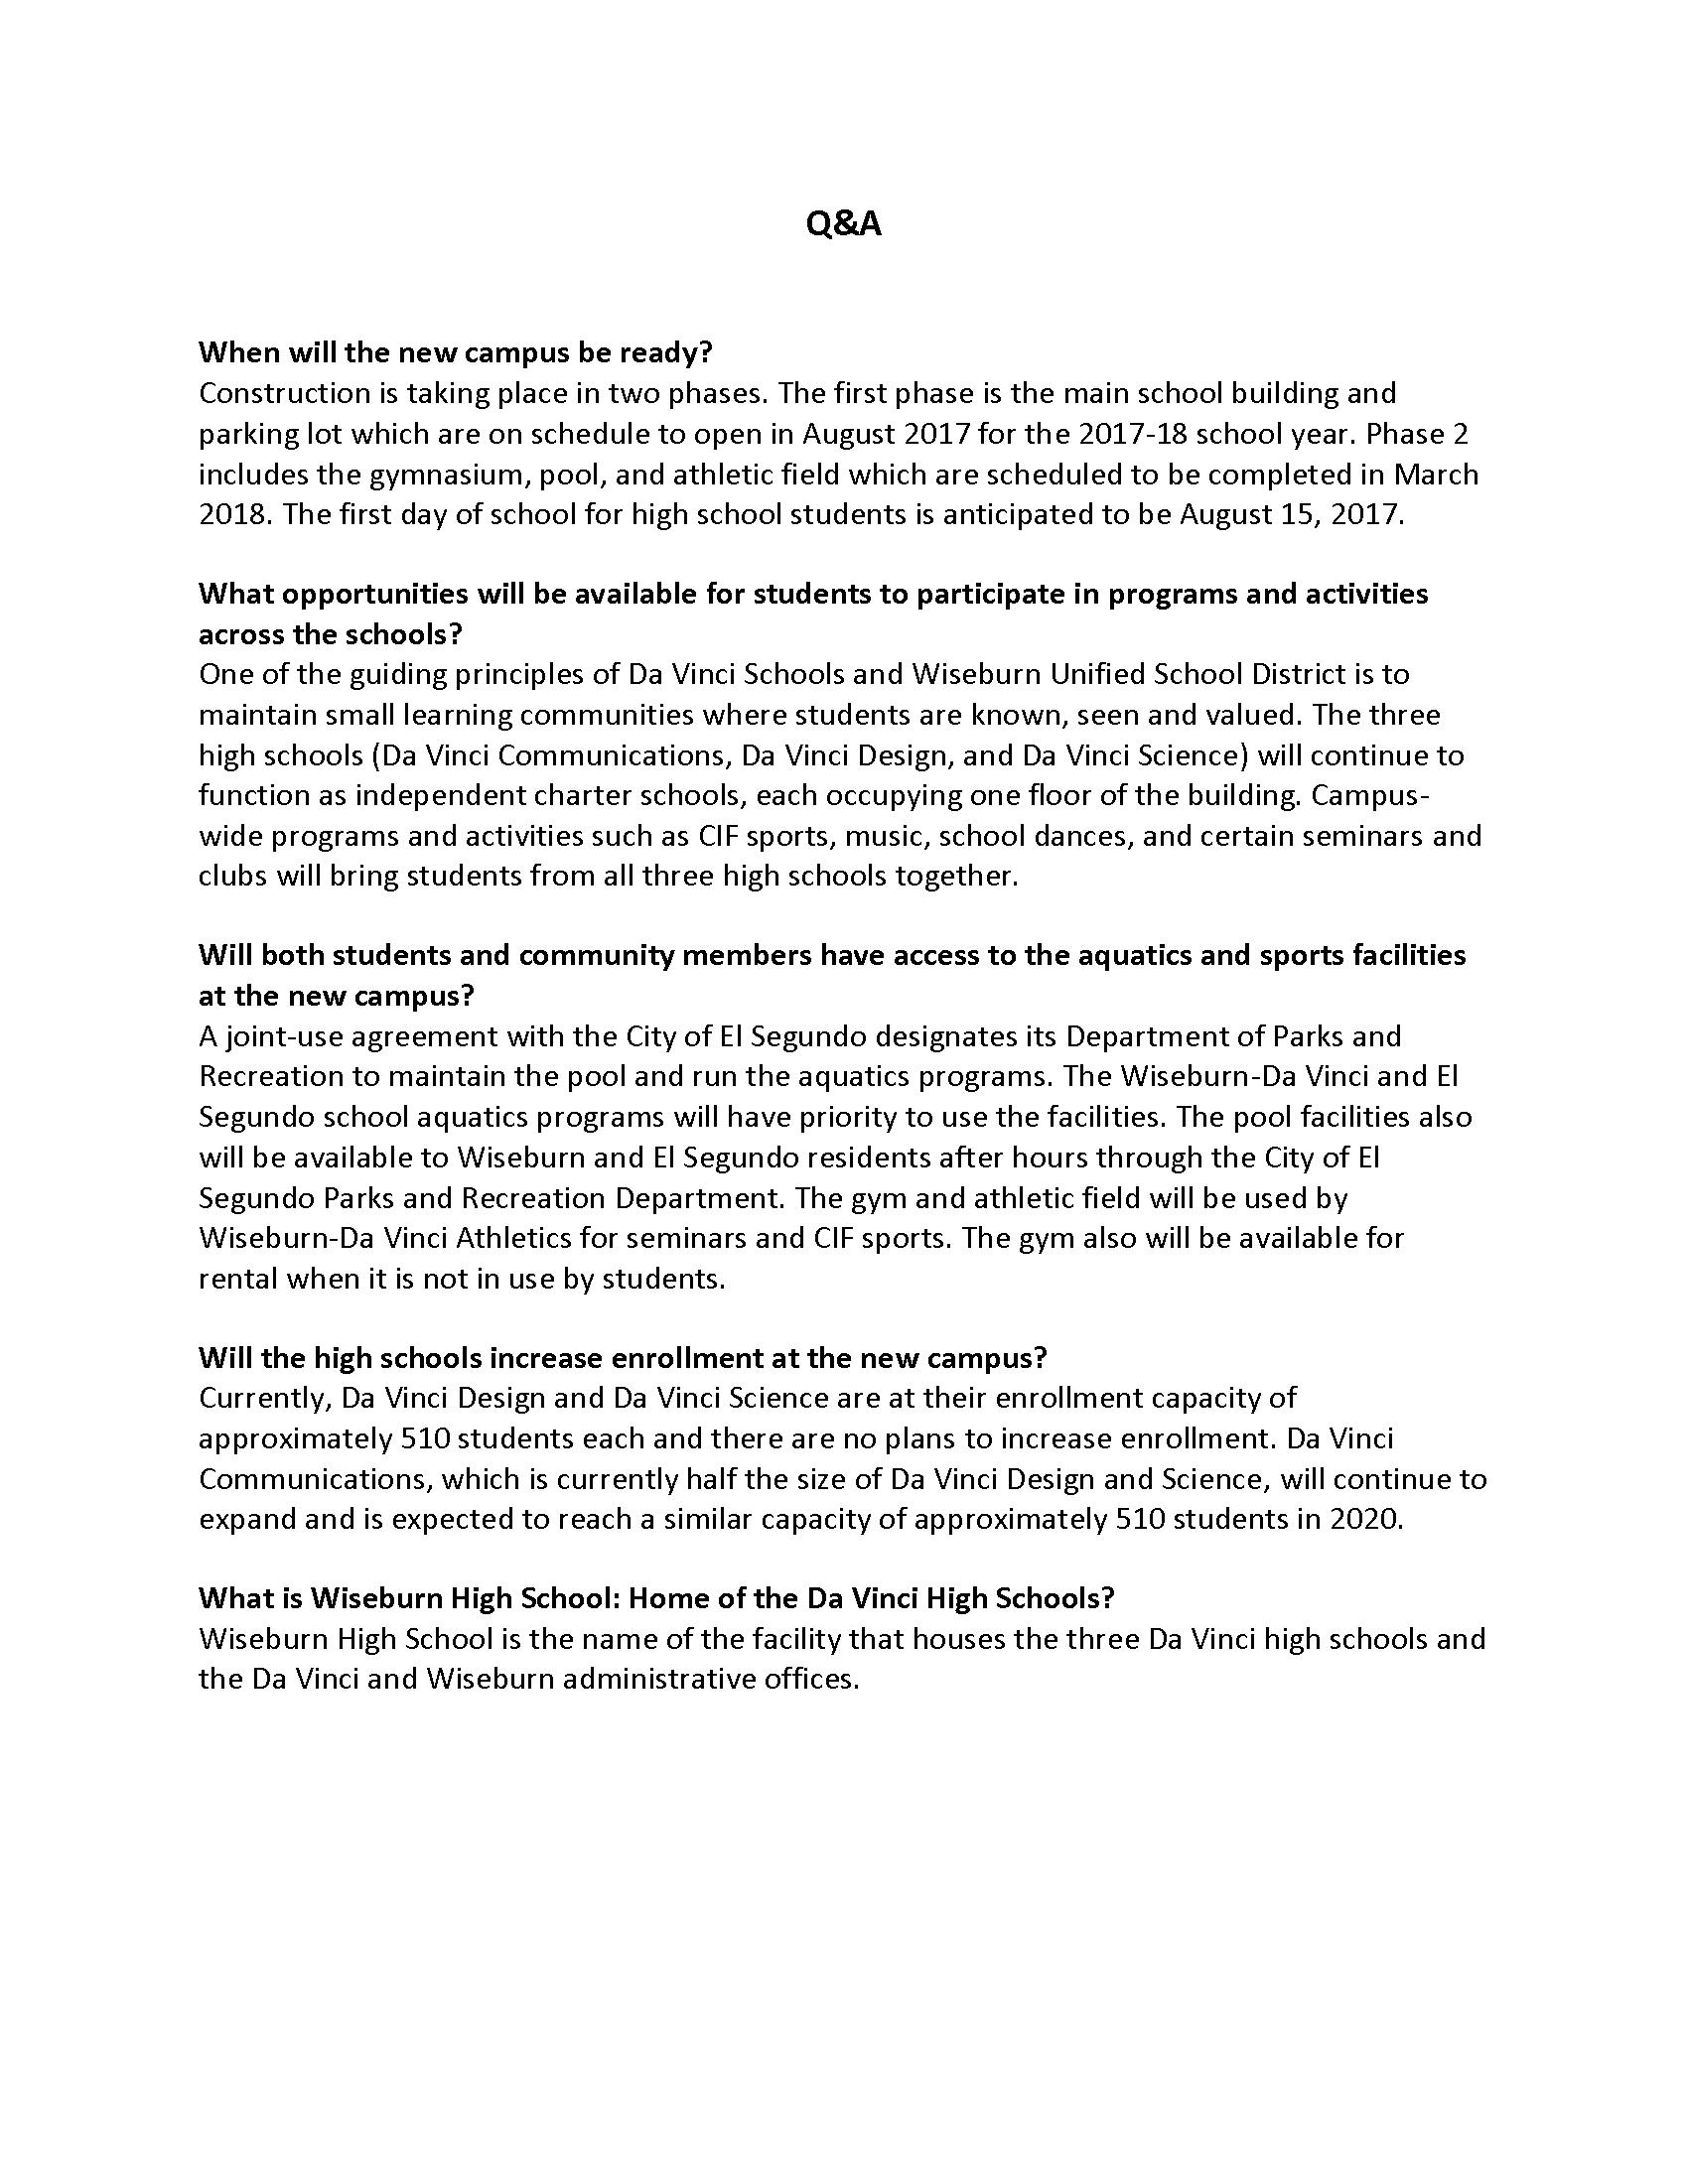 201-fact-sheet_page_2